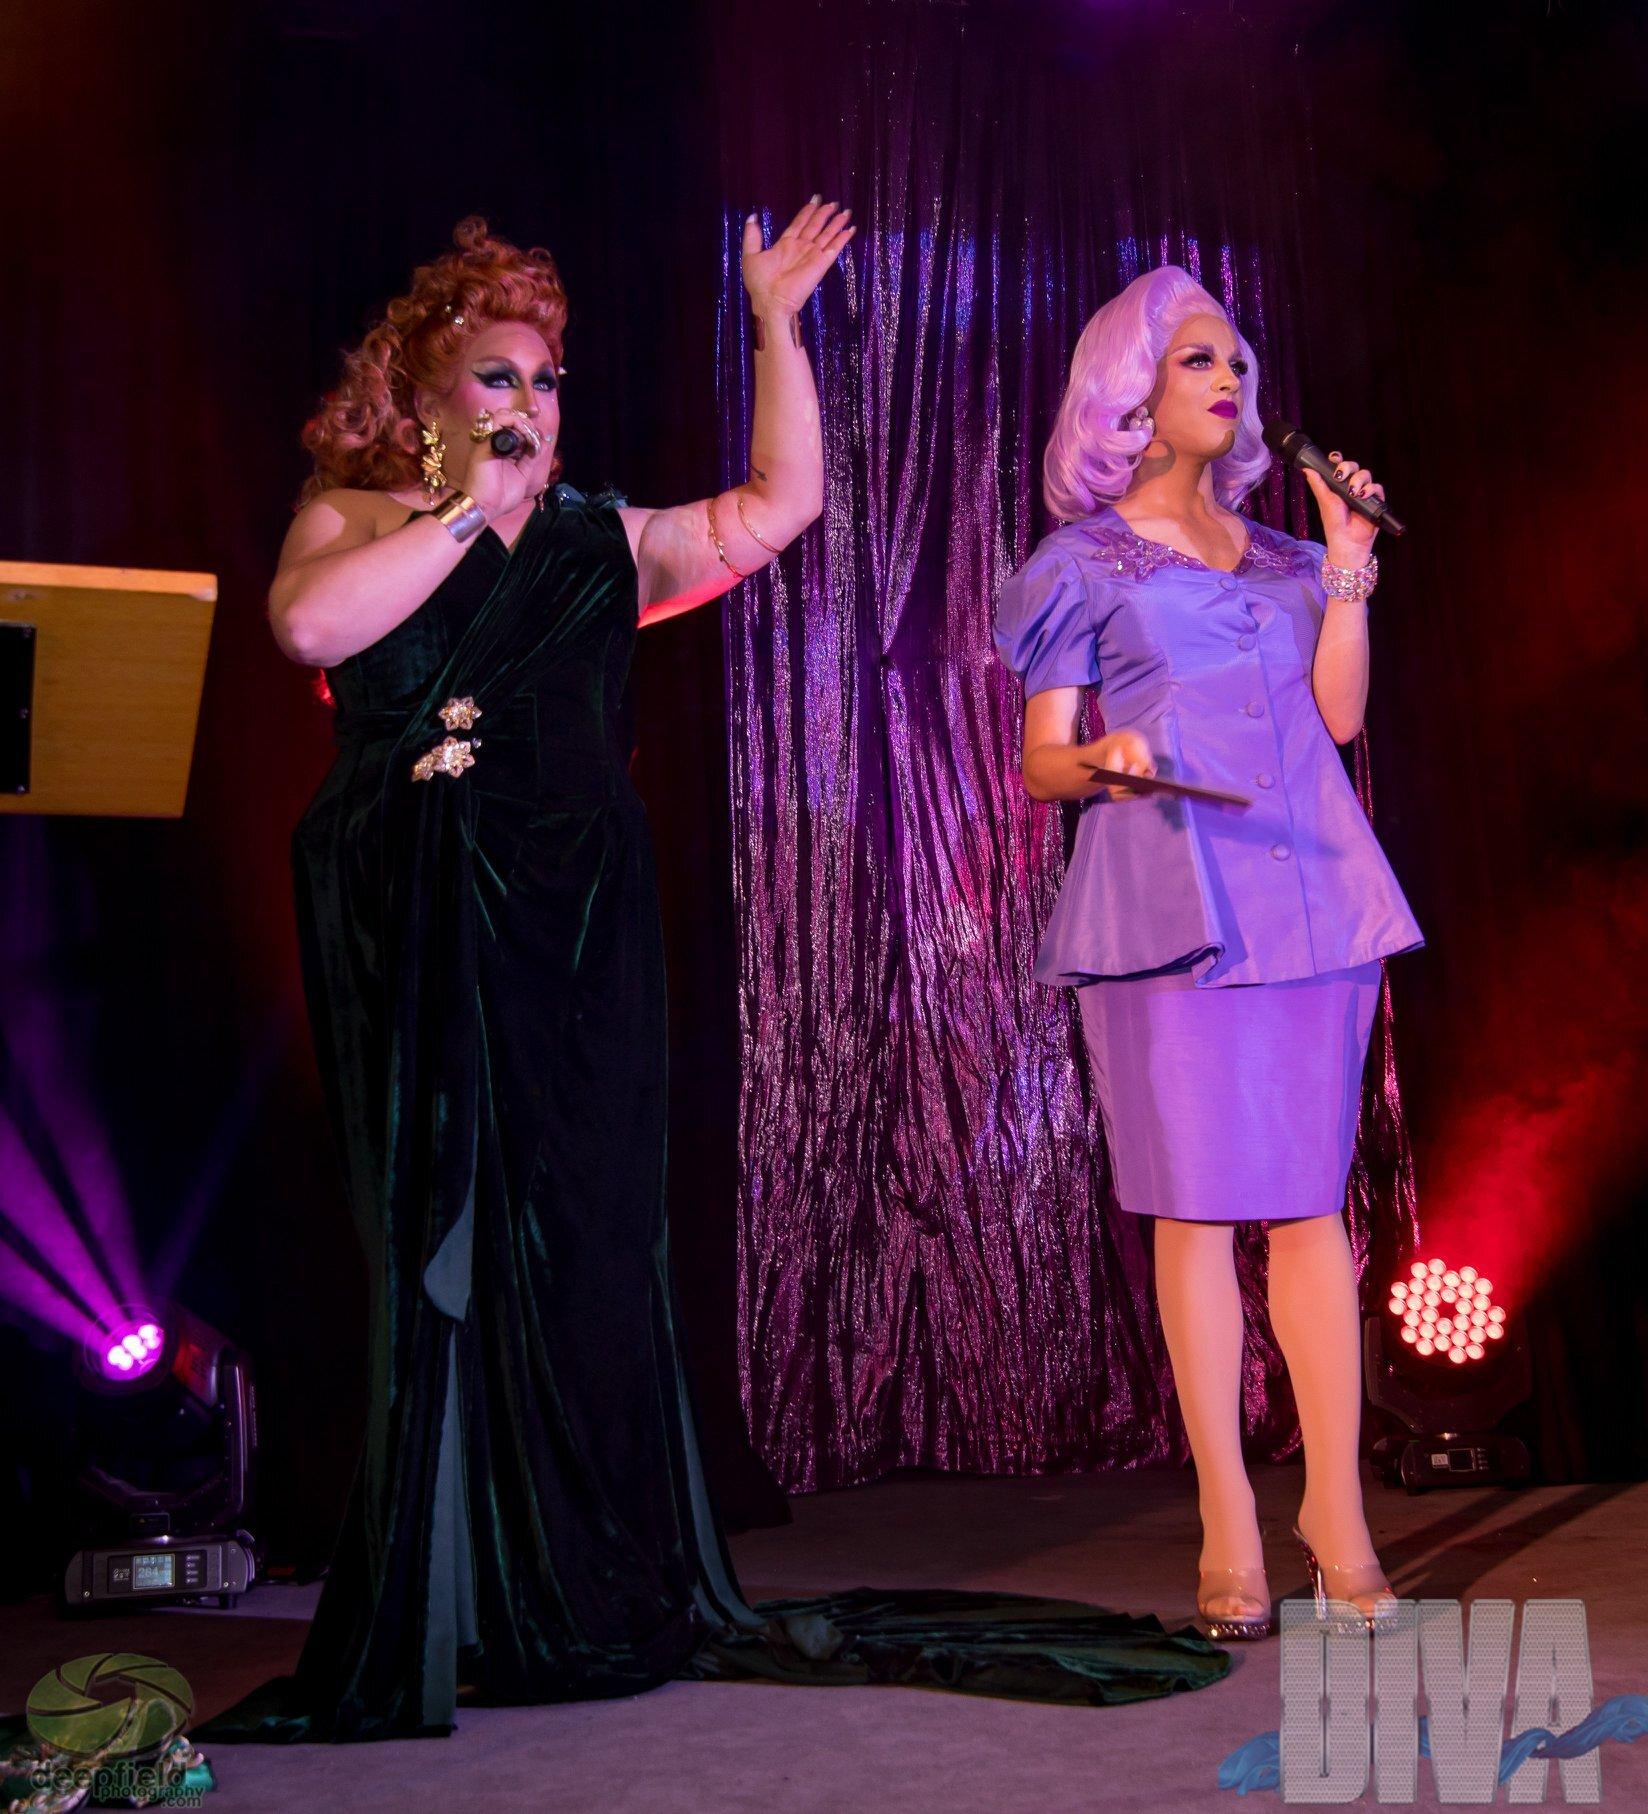 pomara-fifth-fran-giapanni-host-hosting-diva-awards-sydney-drag-queen-royalty-best-hire-drag-race-australia.jpg